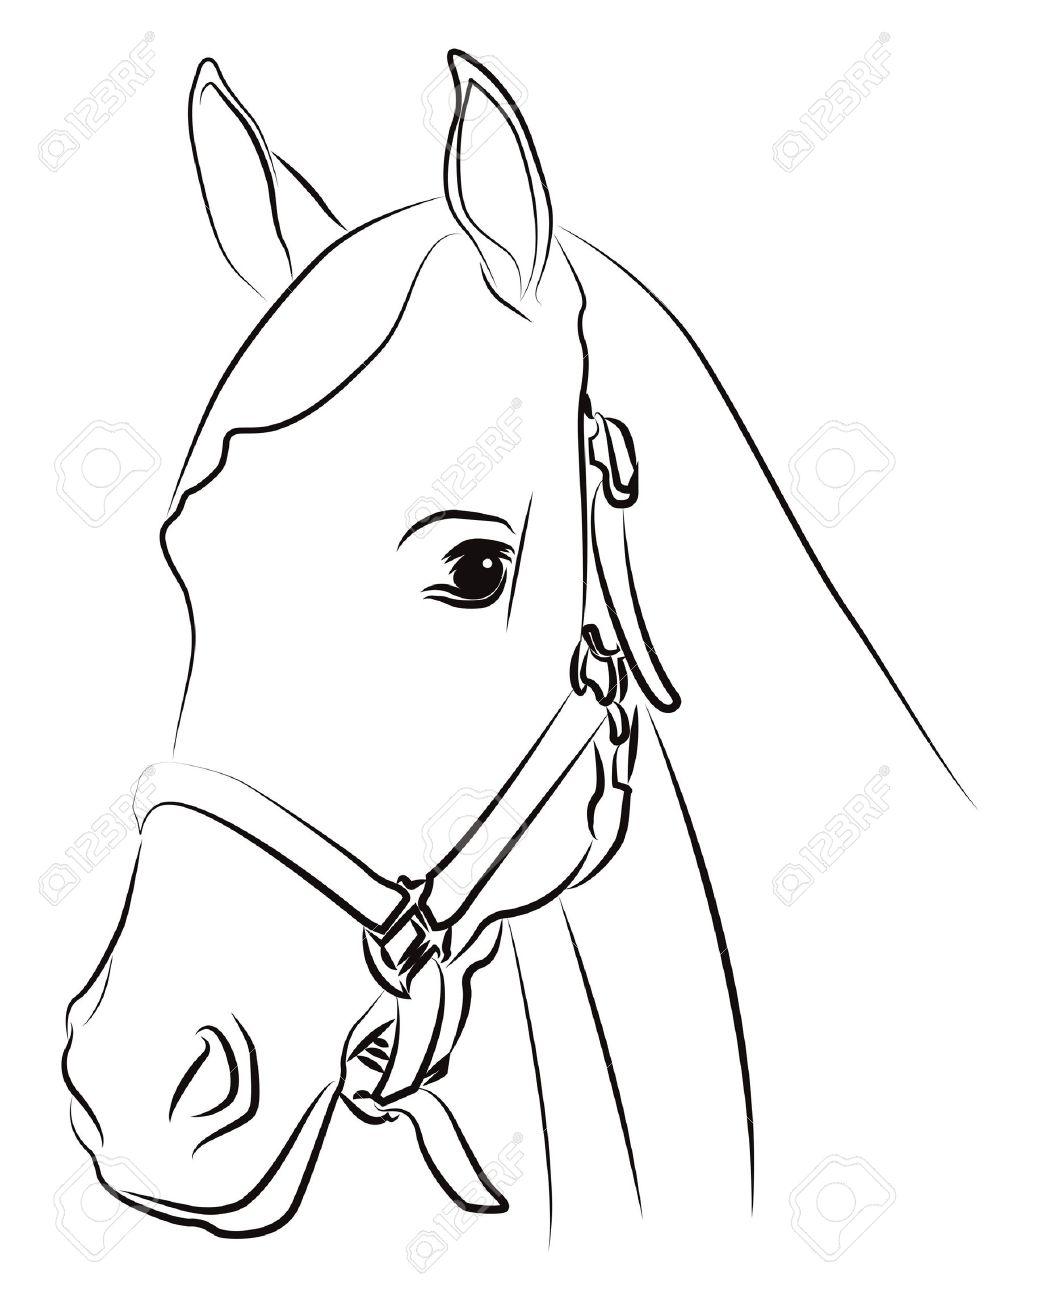 Раскраска голова лошади